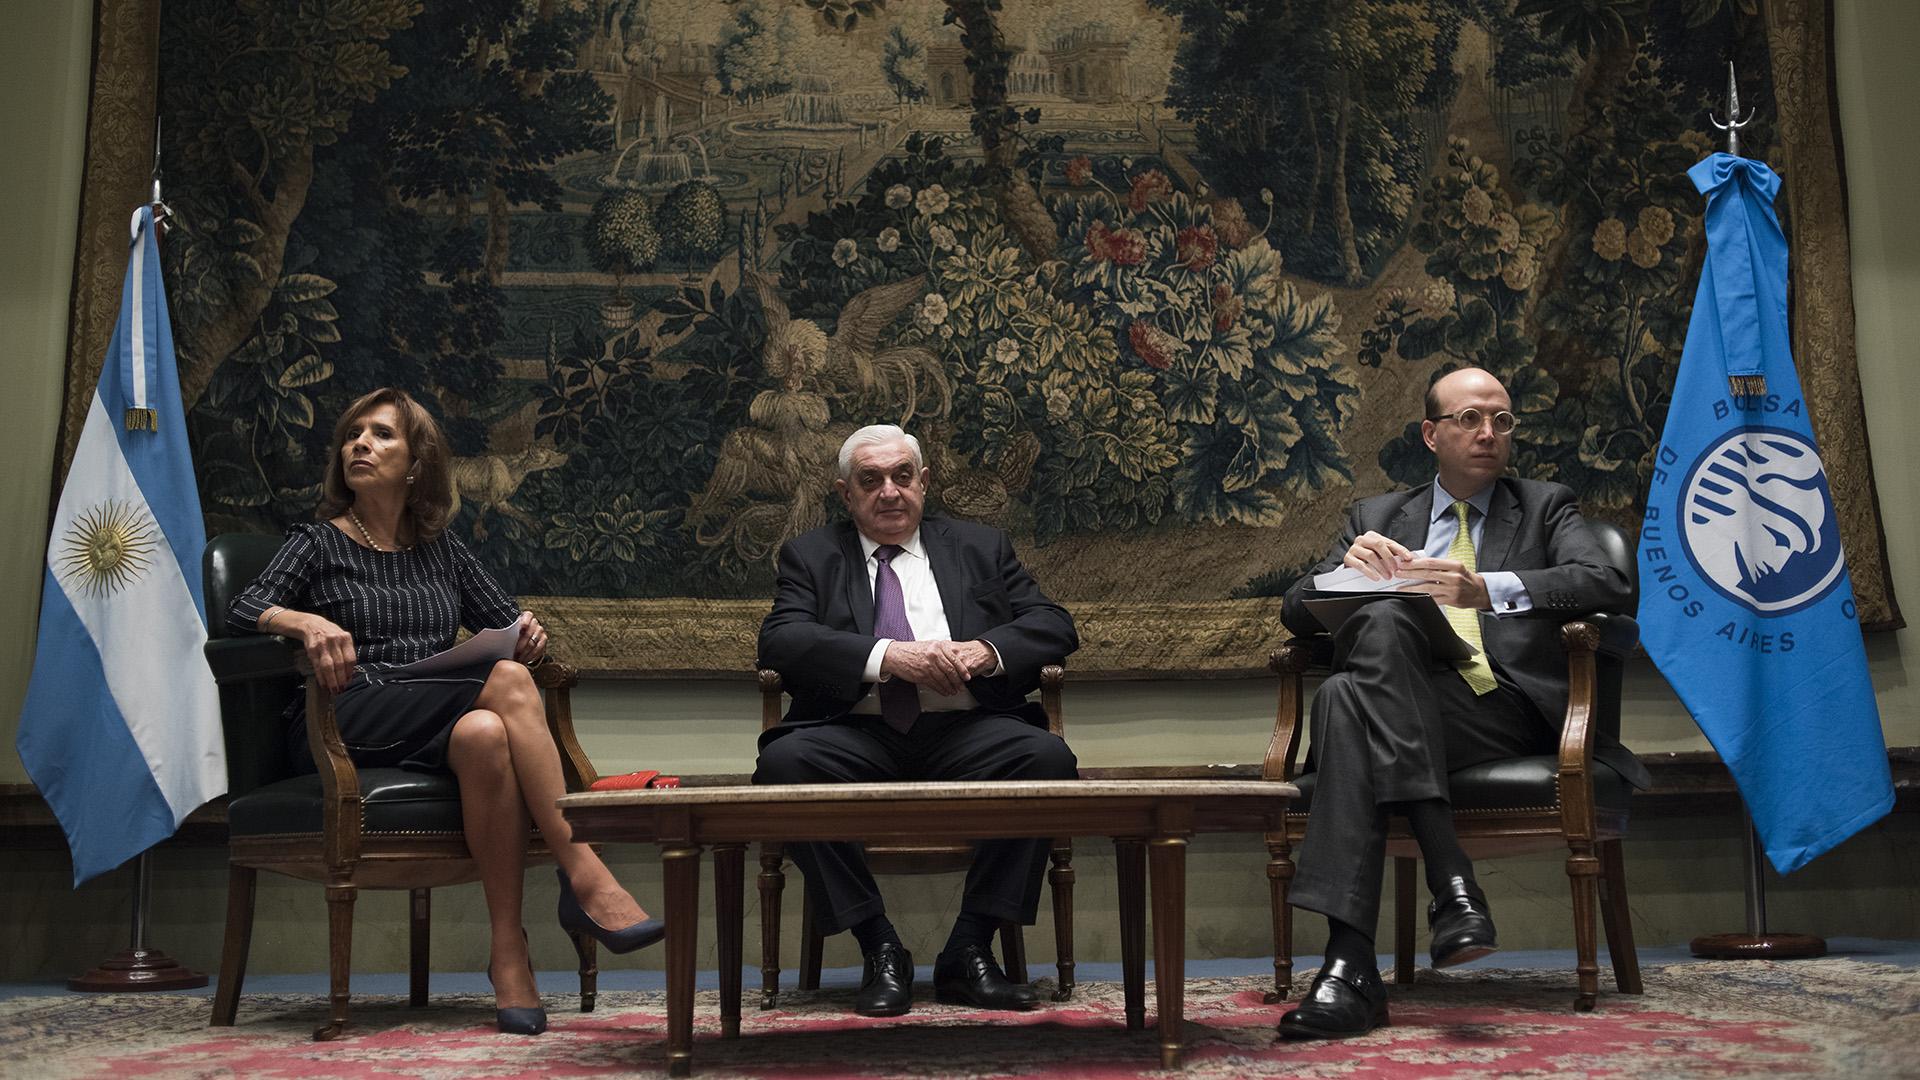 Laura Velázquez presidenta FEPESNA, Adelmo Gabbi, presidente de Bolsa de Comercio, y Andrés Rugeles, director representante de CAF en Argentina (Adrián Escandar)